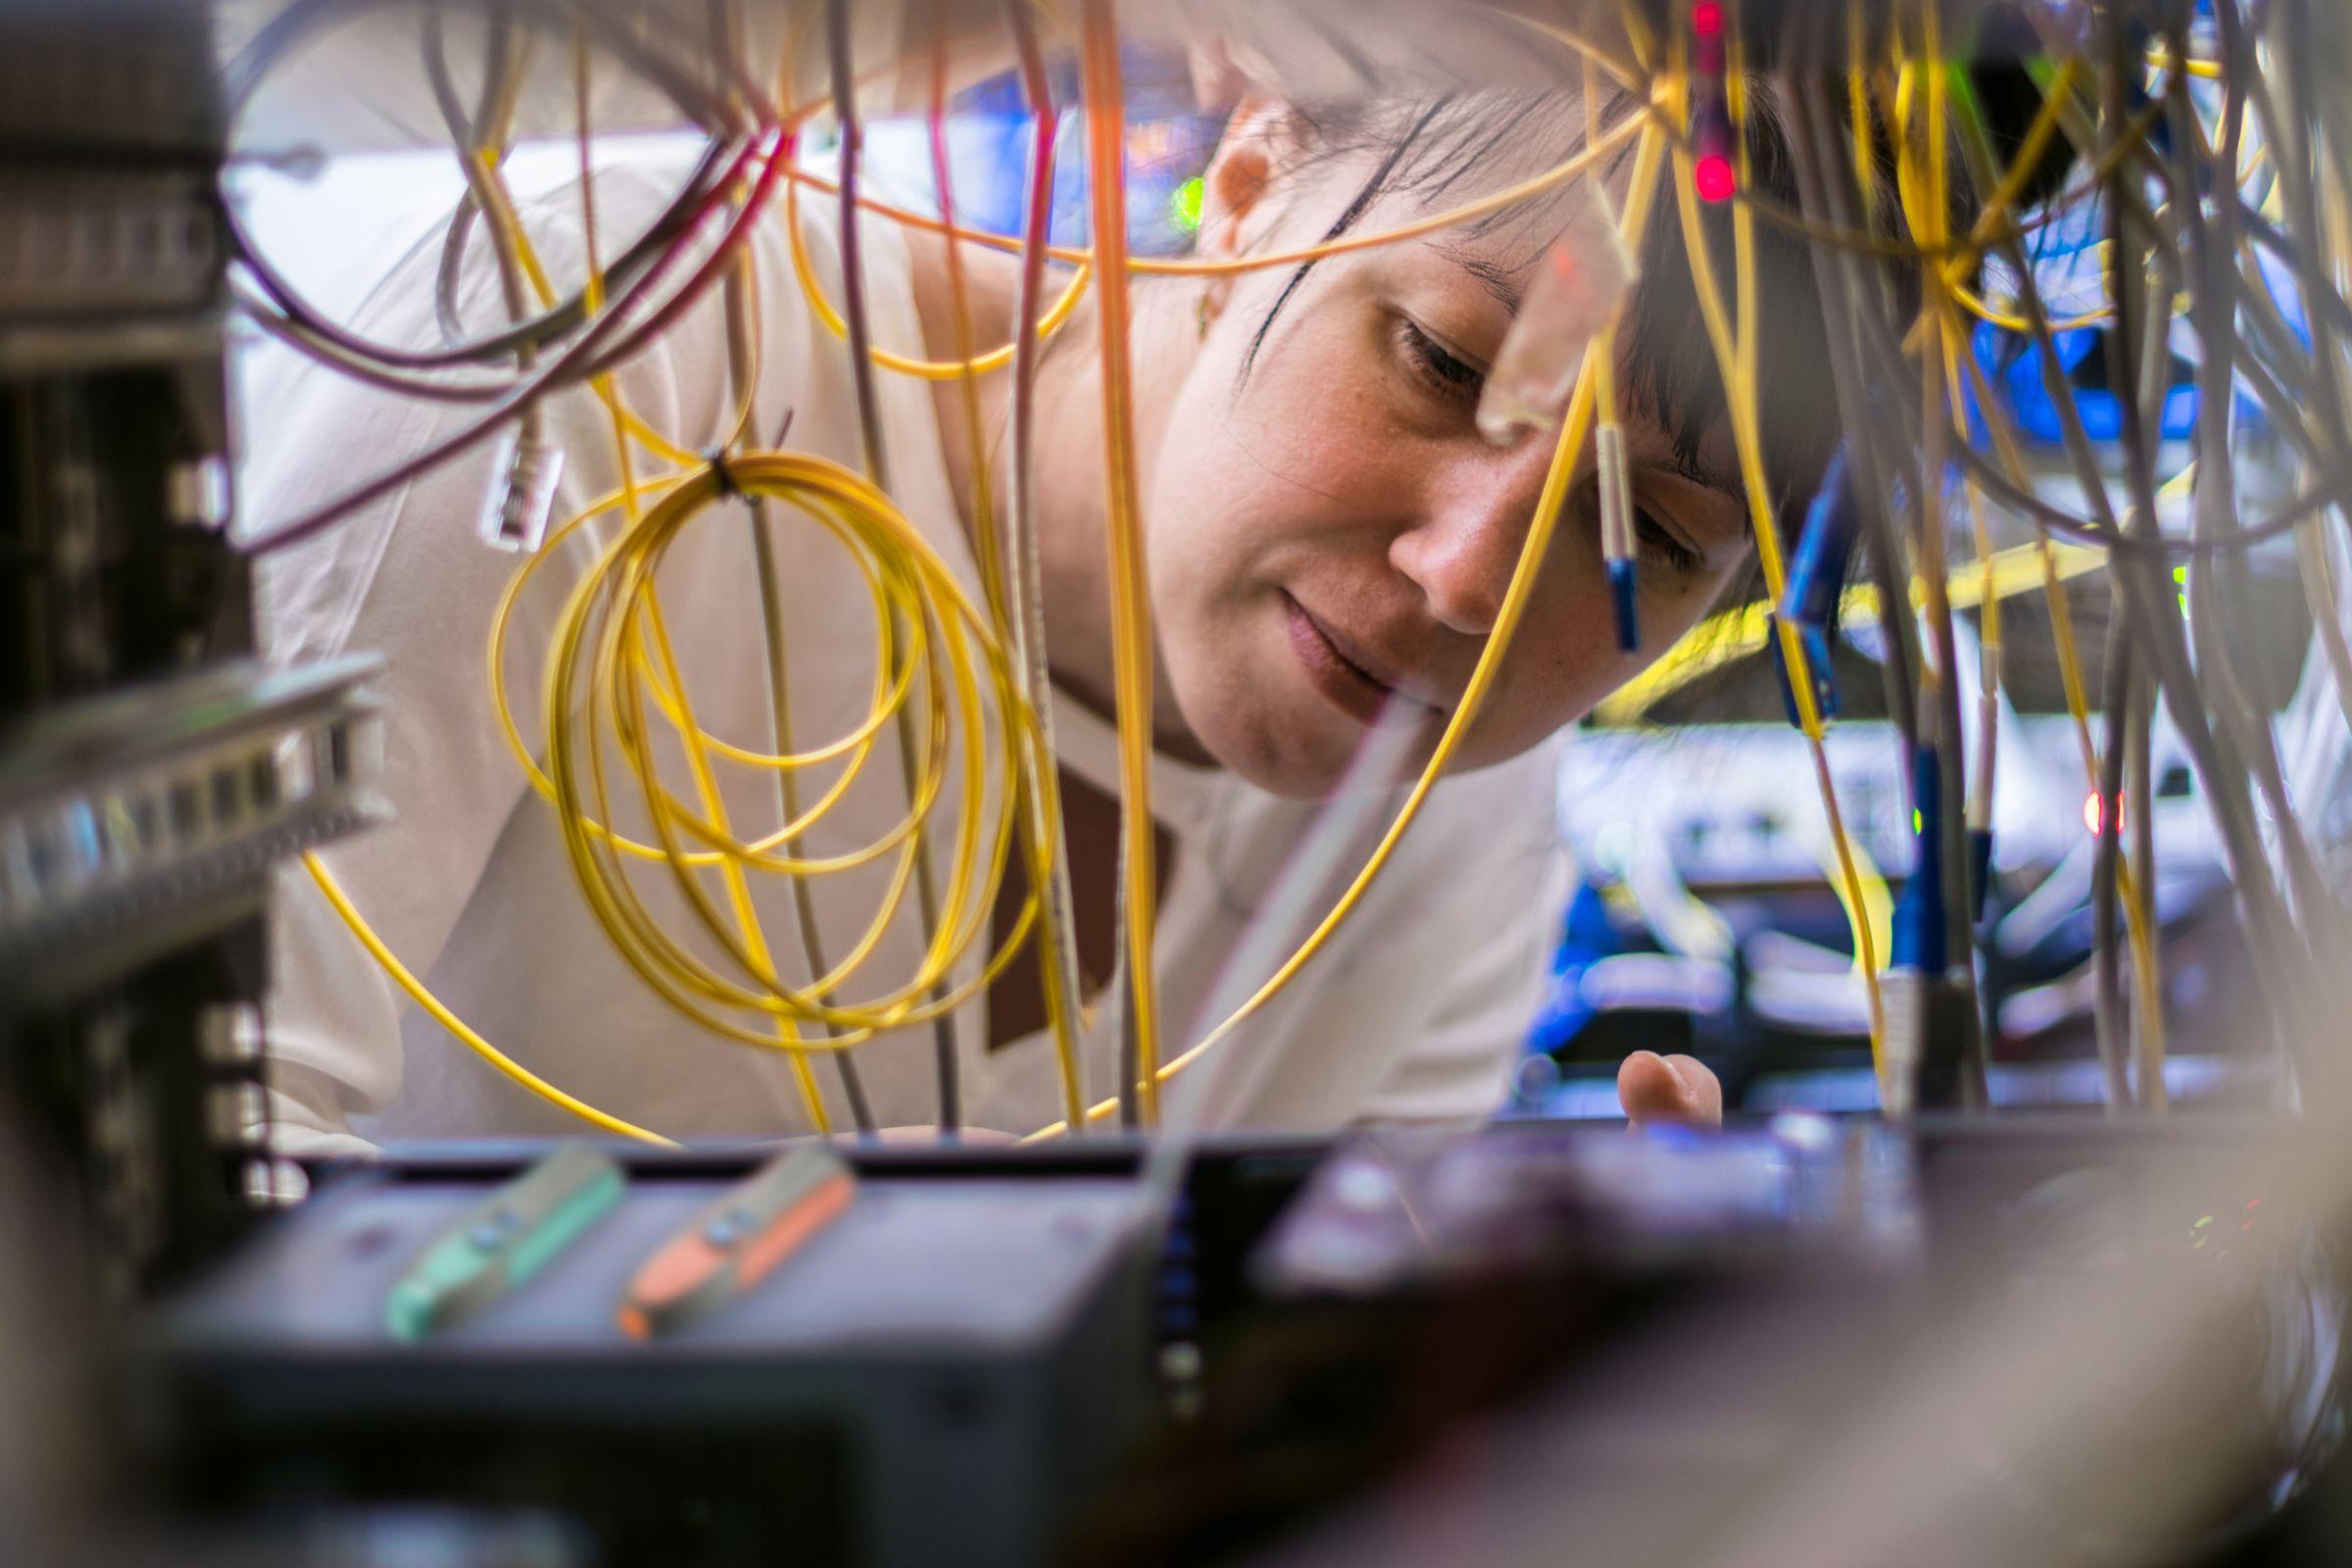 Esta categoria inclui teste de BERT, hub de teste de fibra óptica e ferramenta de teste óptico.